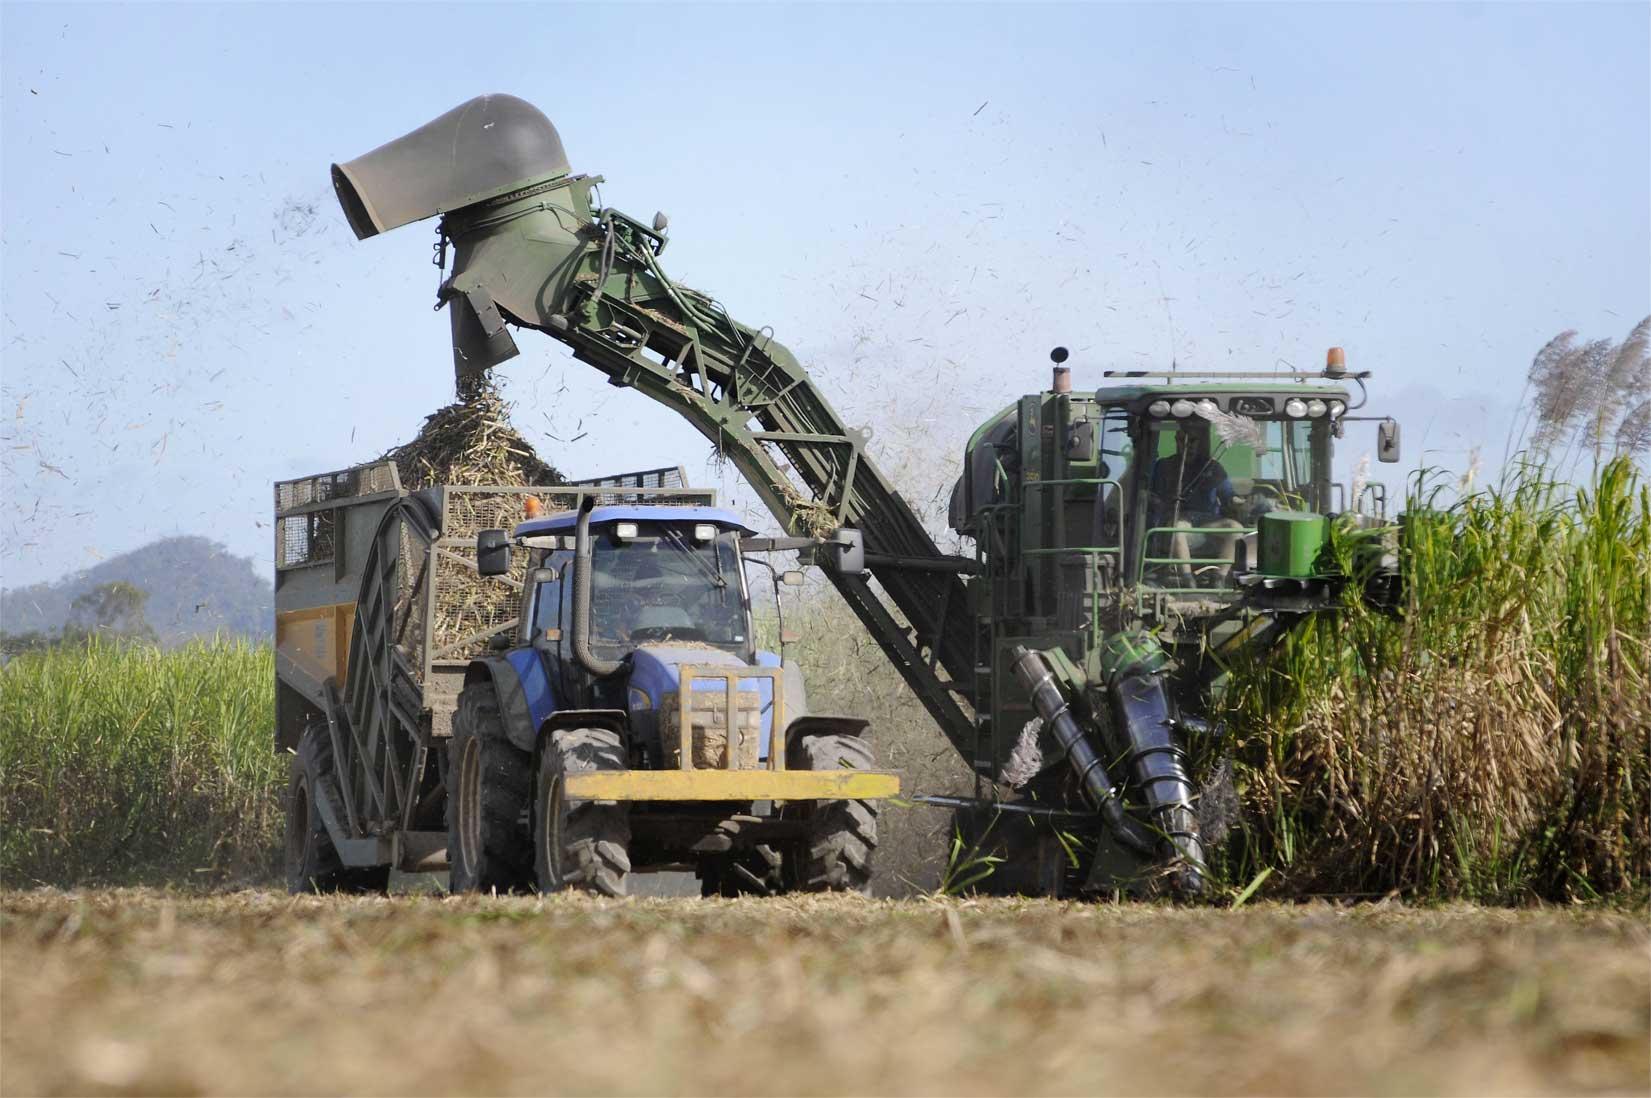 Image - Sugar industry machinery harvesting sugar cane